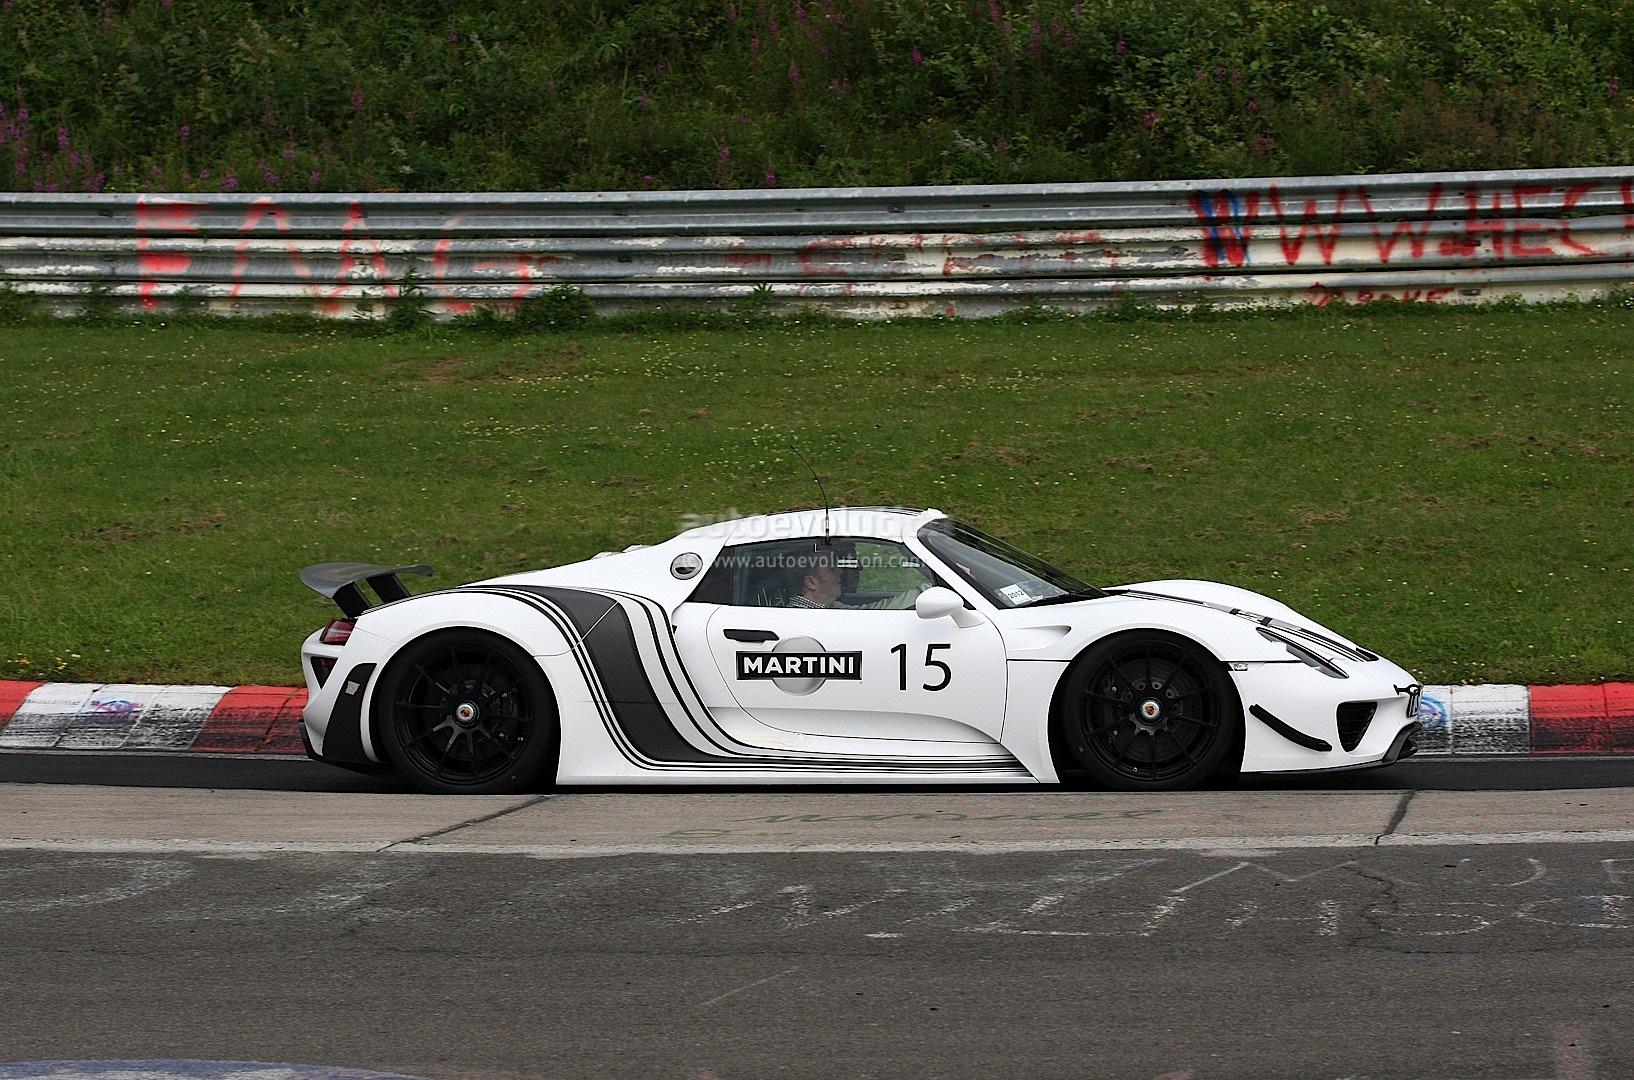 Spyshots Porsche 918 Spyder In Martini Racing Stripes